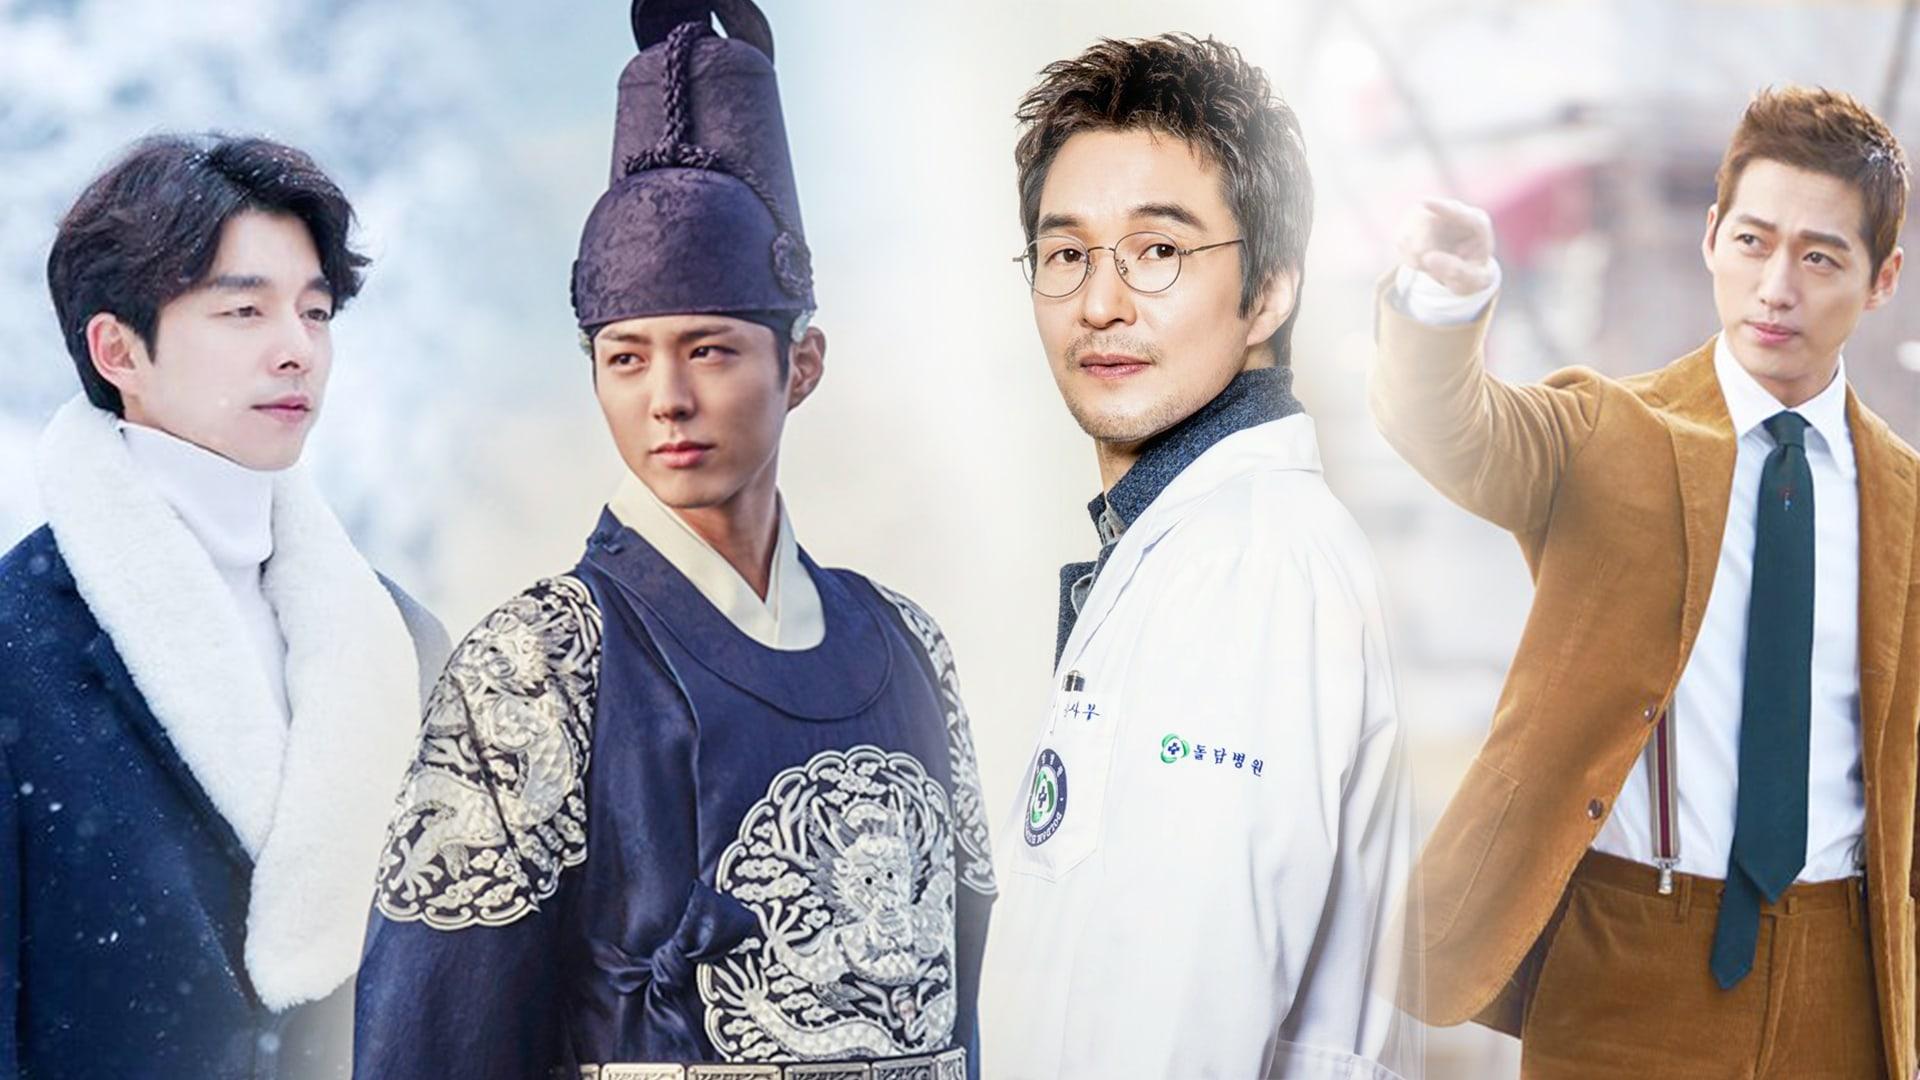 Gong Yoo, Park Bo Gum, Han Suk Kyu, Jo Jung Suk y Namgoong Min nominados a Mejor Actor + Lista completa de nominados a los Baeksang Art Awards